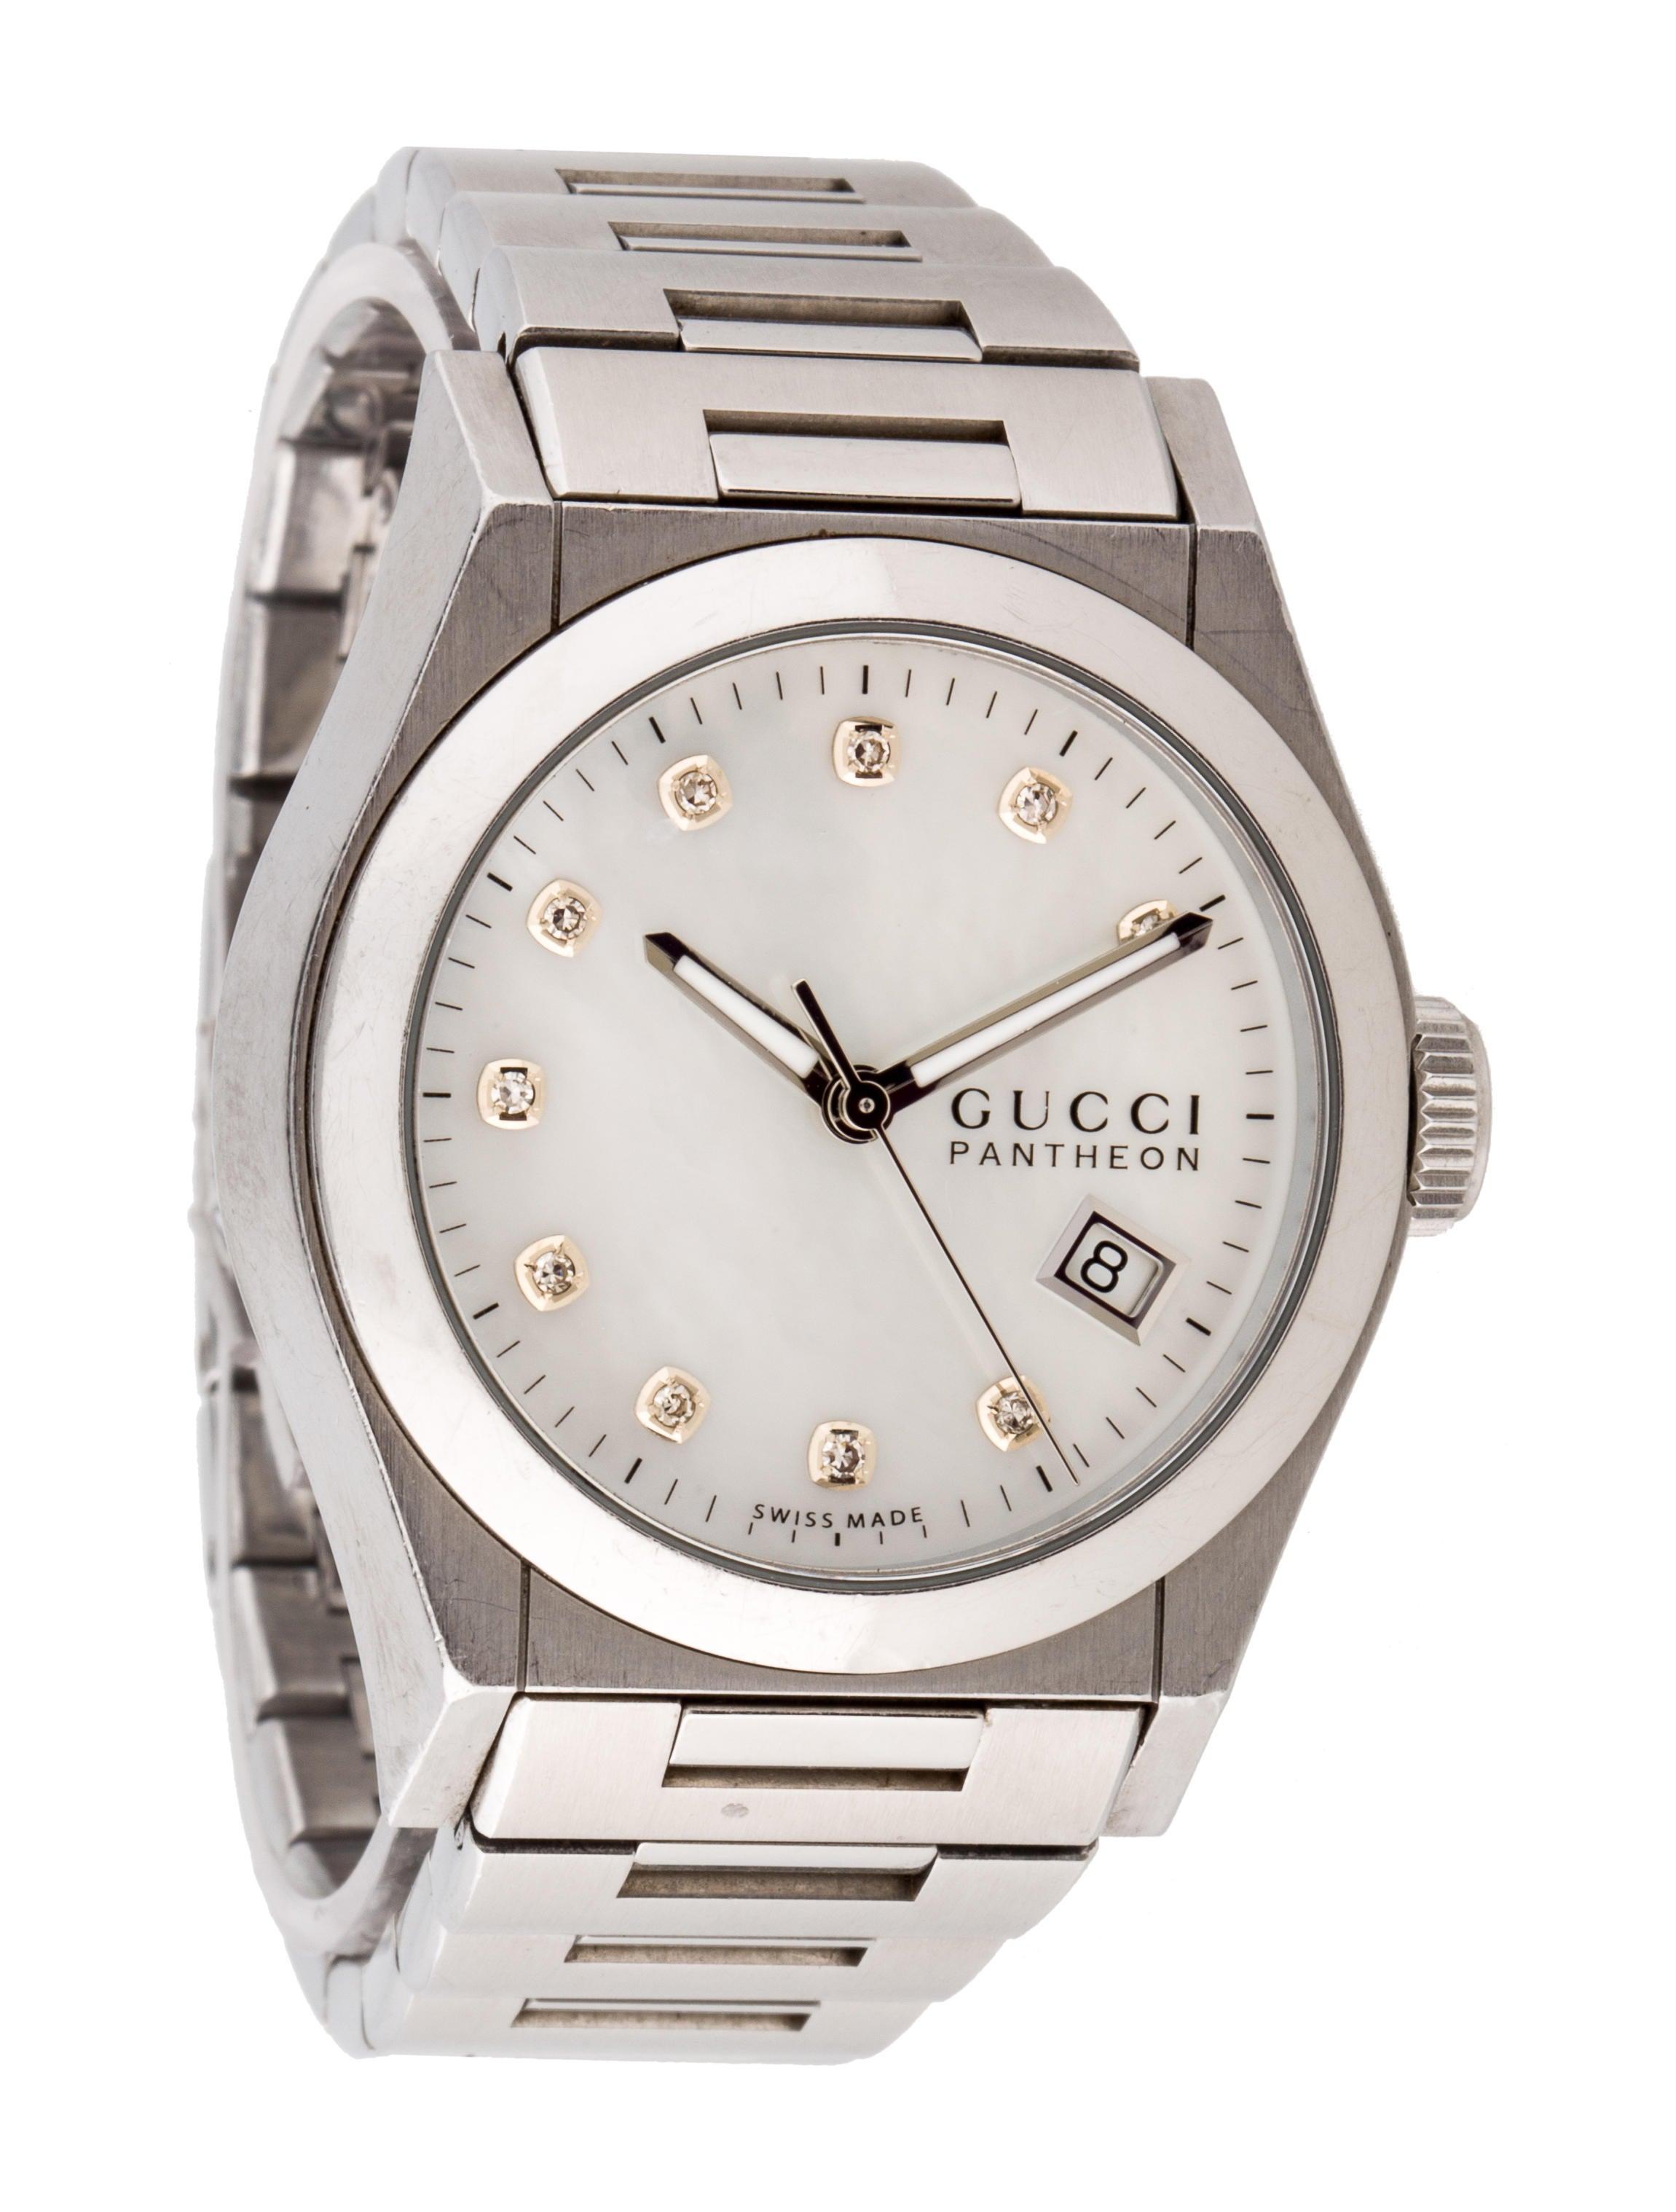 cd45a3bee77 Gucci Pantheon Diamond Watch - Bracelet - GUC67431